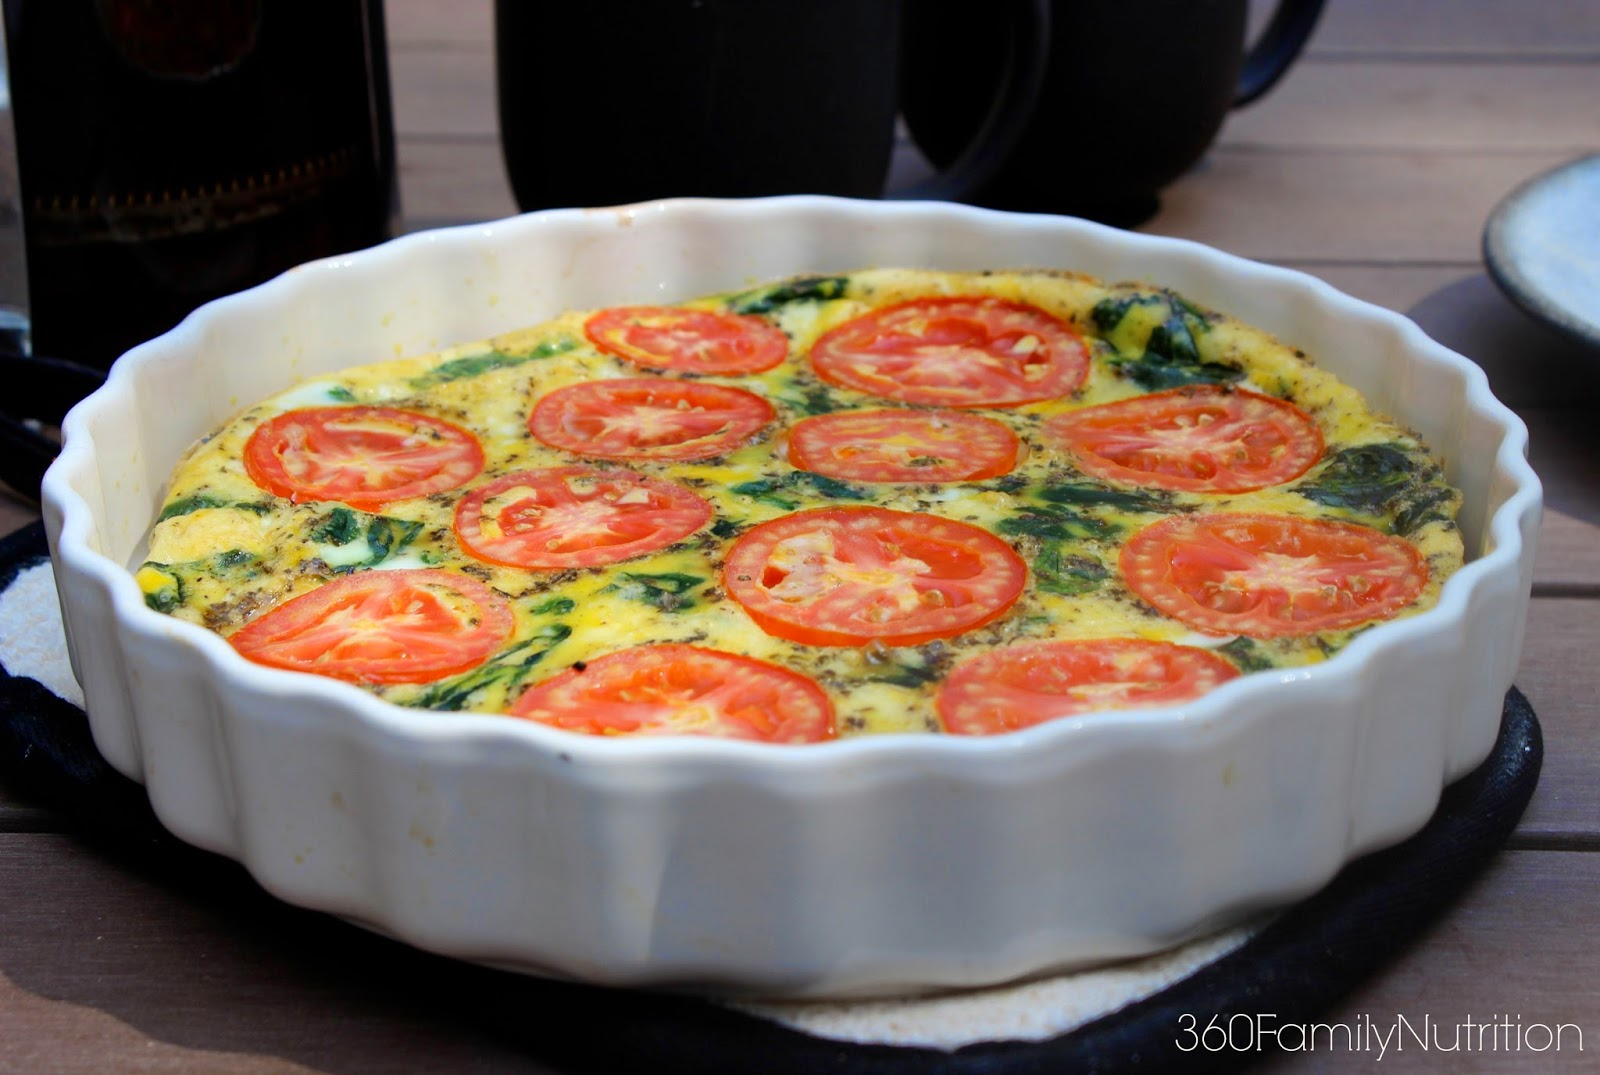 360FamilyNutrition: Spinach Tomato Frittata